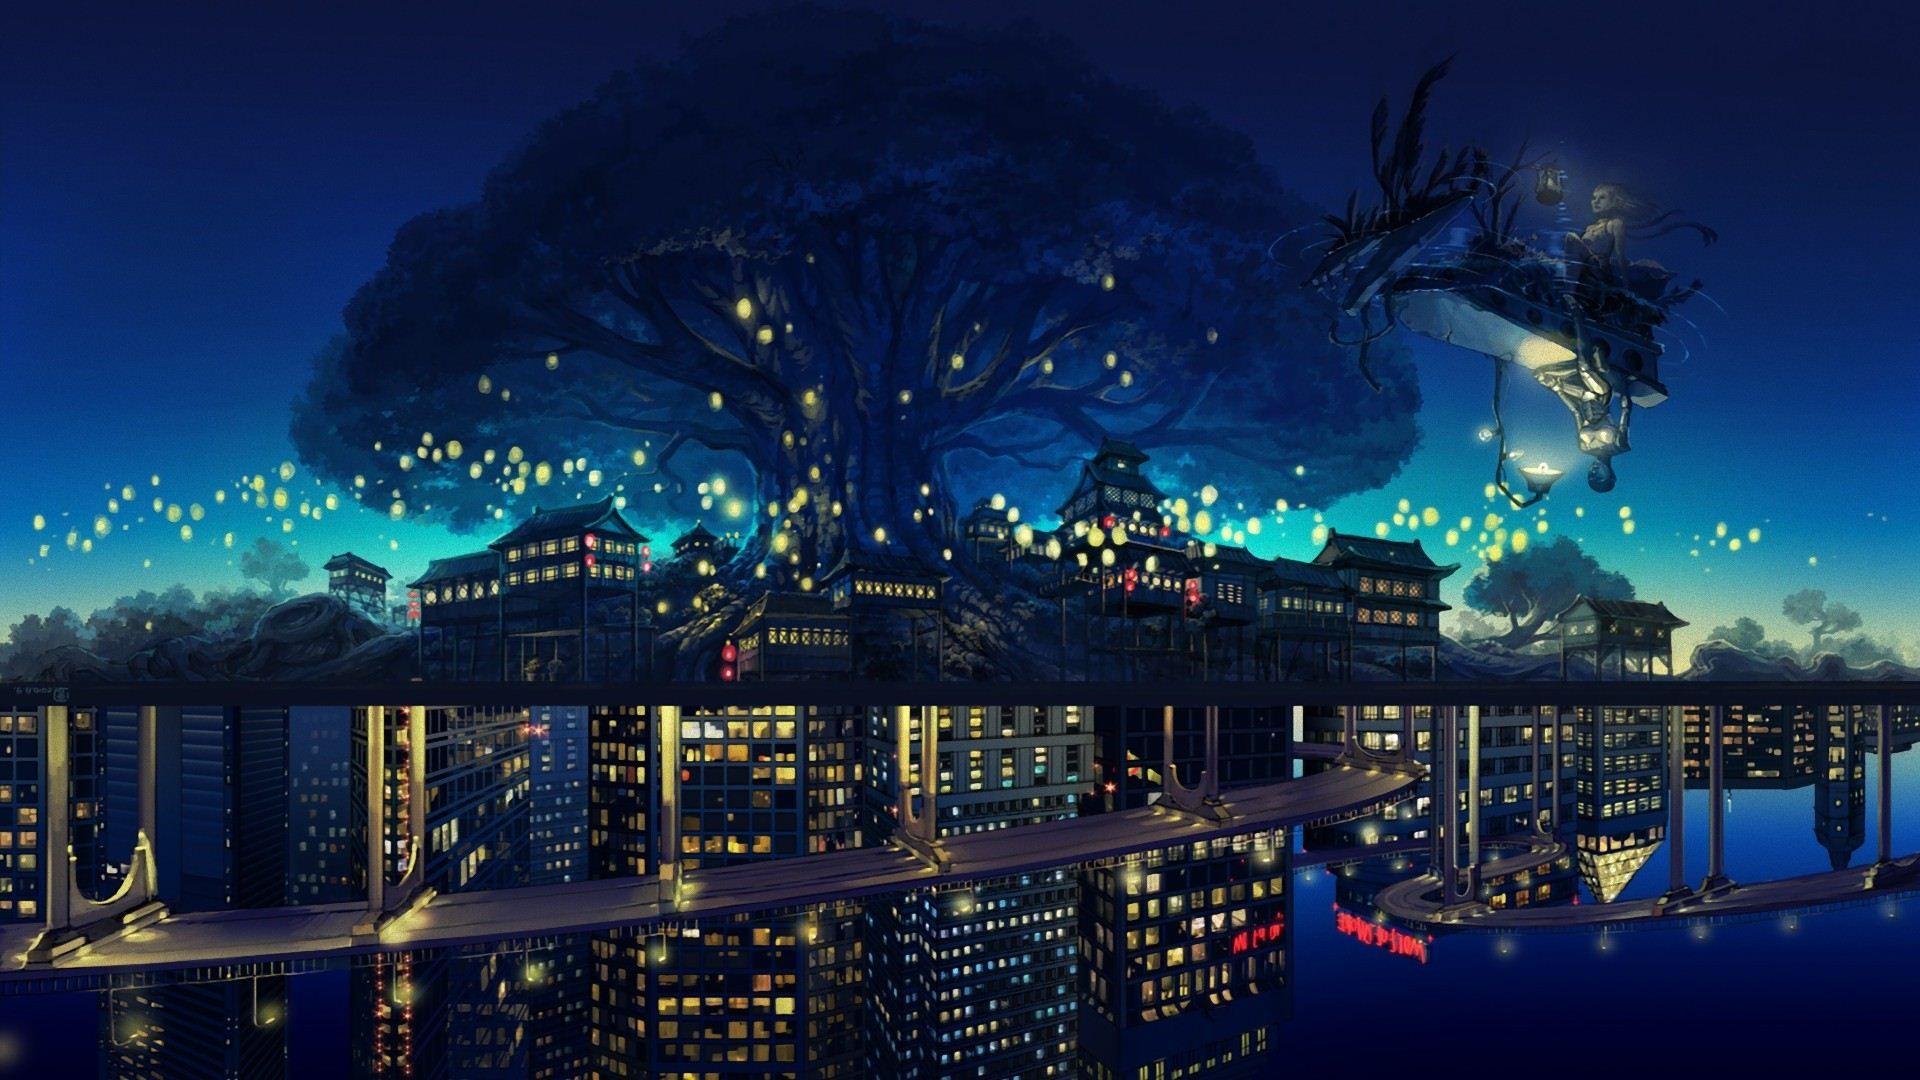 Pin By Joshua Soon On Fxp Anime City City Wallpaper City Landscape